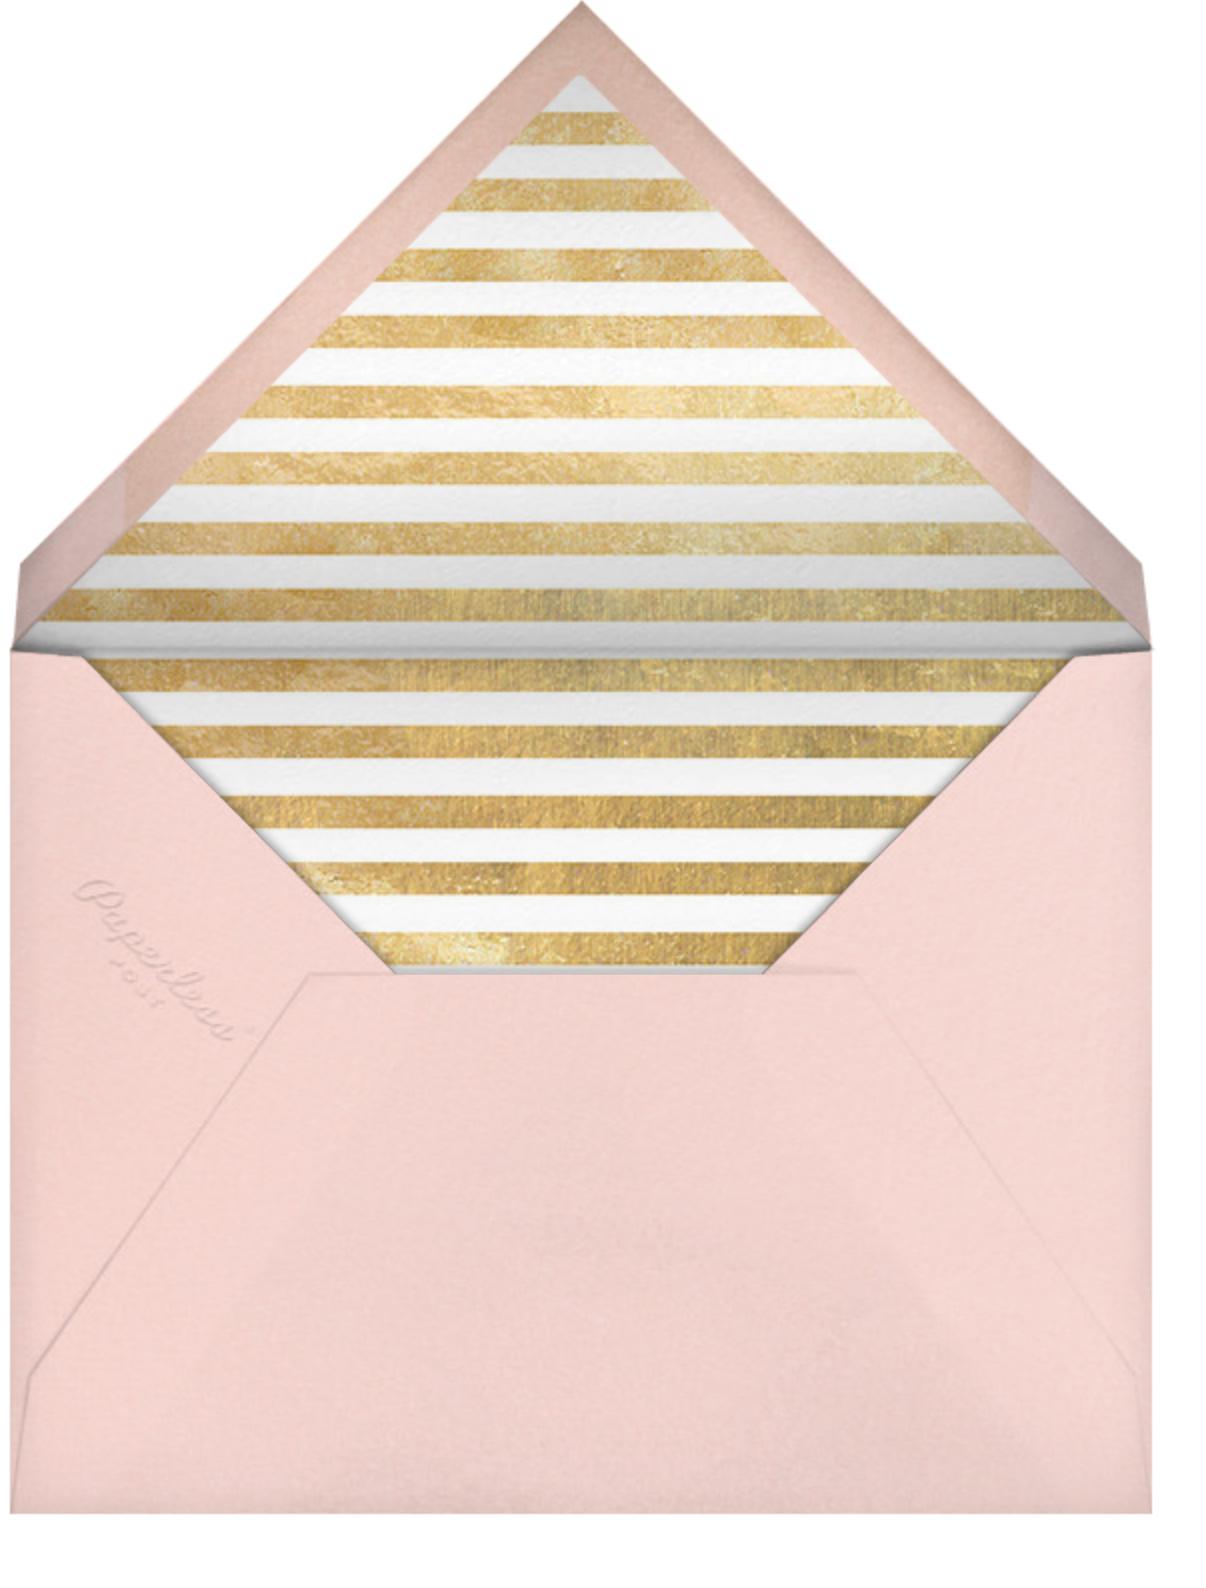 Typographic II (Invitation) - Meringue - kate spade new york - All - envelope back